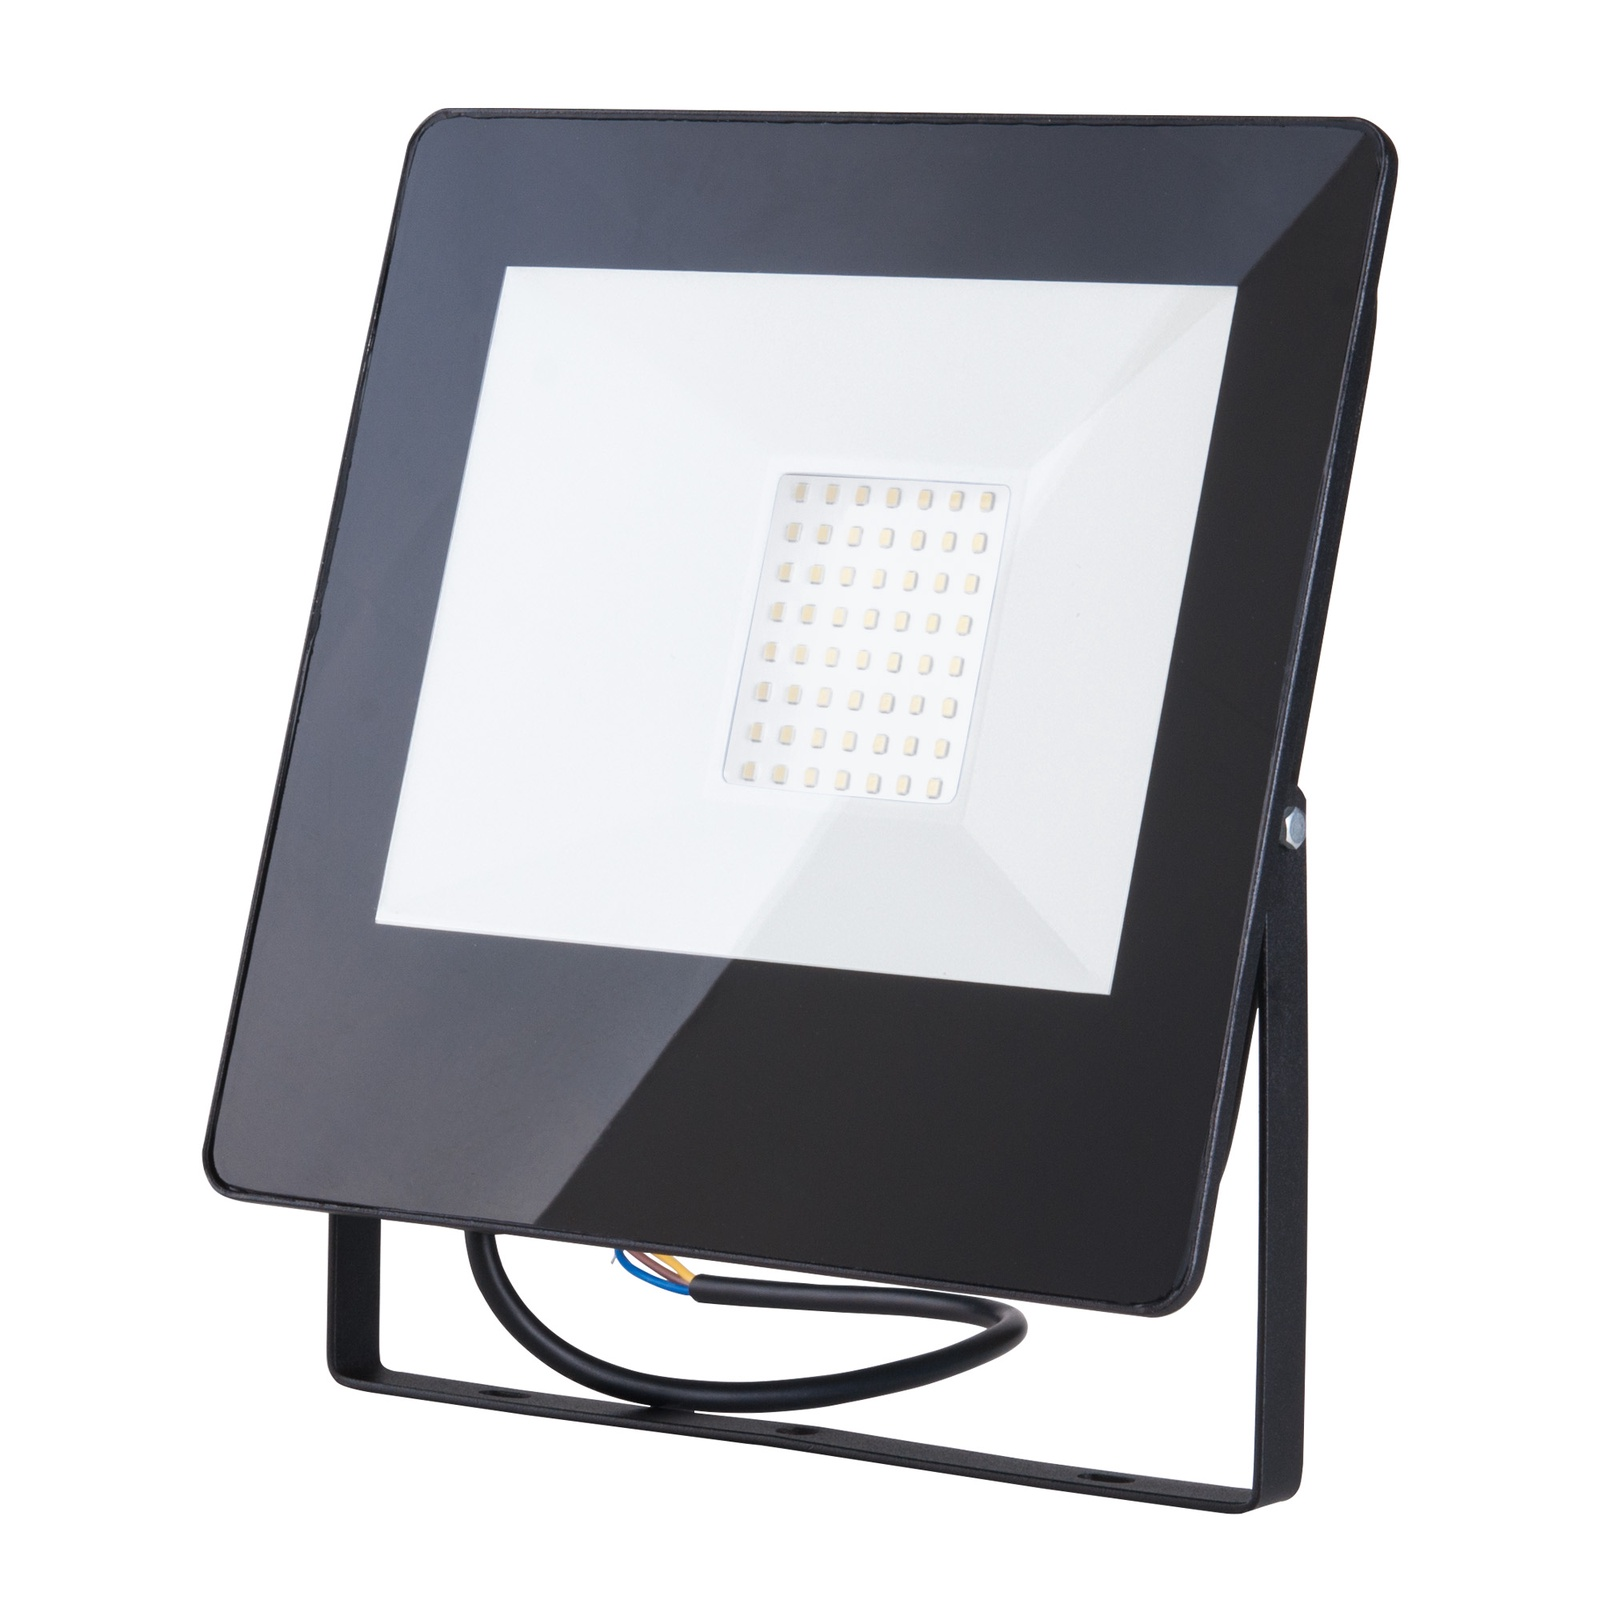 купить Прожектор Elektrostandard светодиодный 015 FL LED 50W 6500K IP65, 6500, 50 Вт онлайн